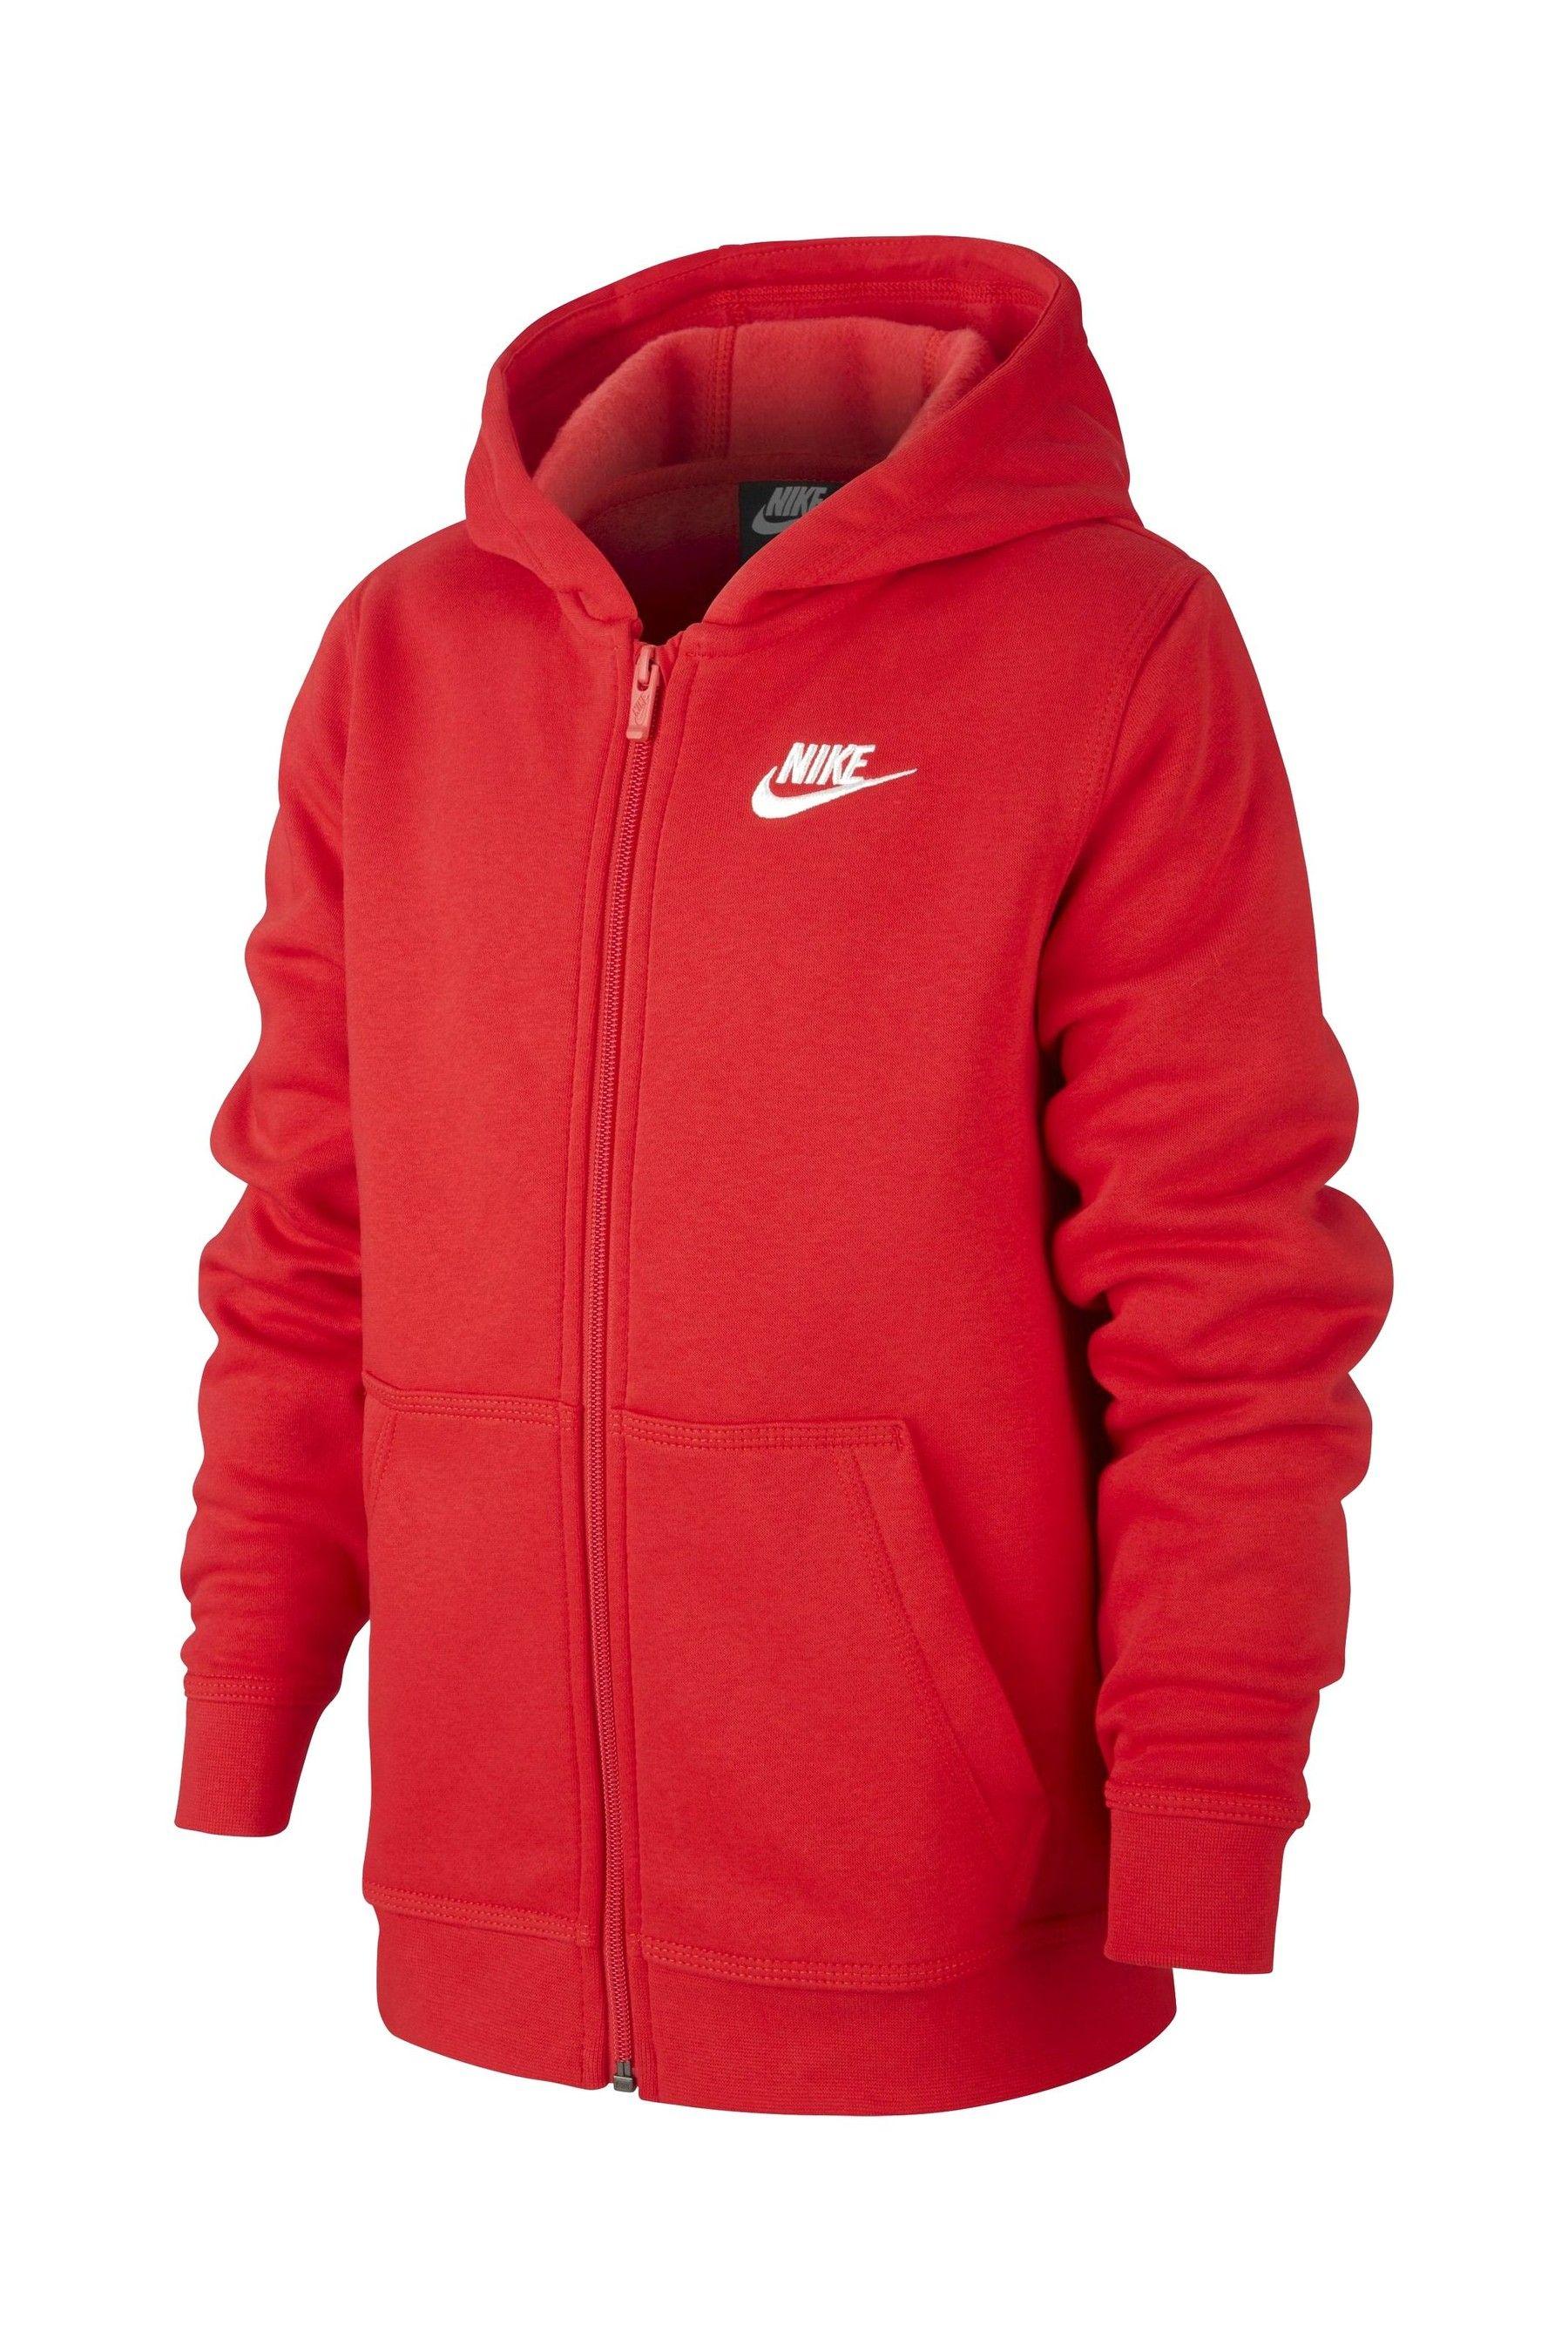 Buy Nike Club Full Zip Hoody From The Next Uk Online Shop Full Zip Hoodie Nike Hoodie Outfit Hoodies